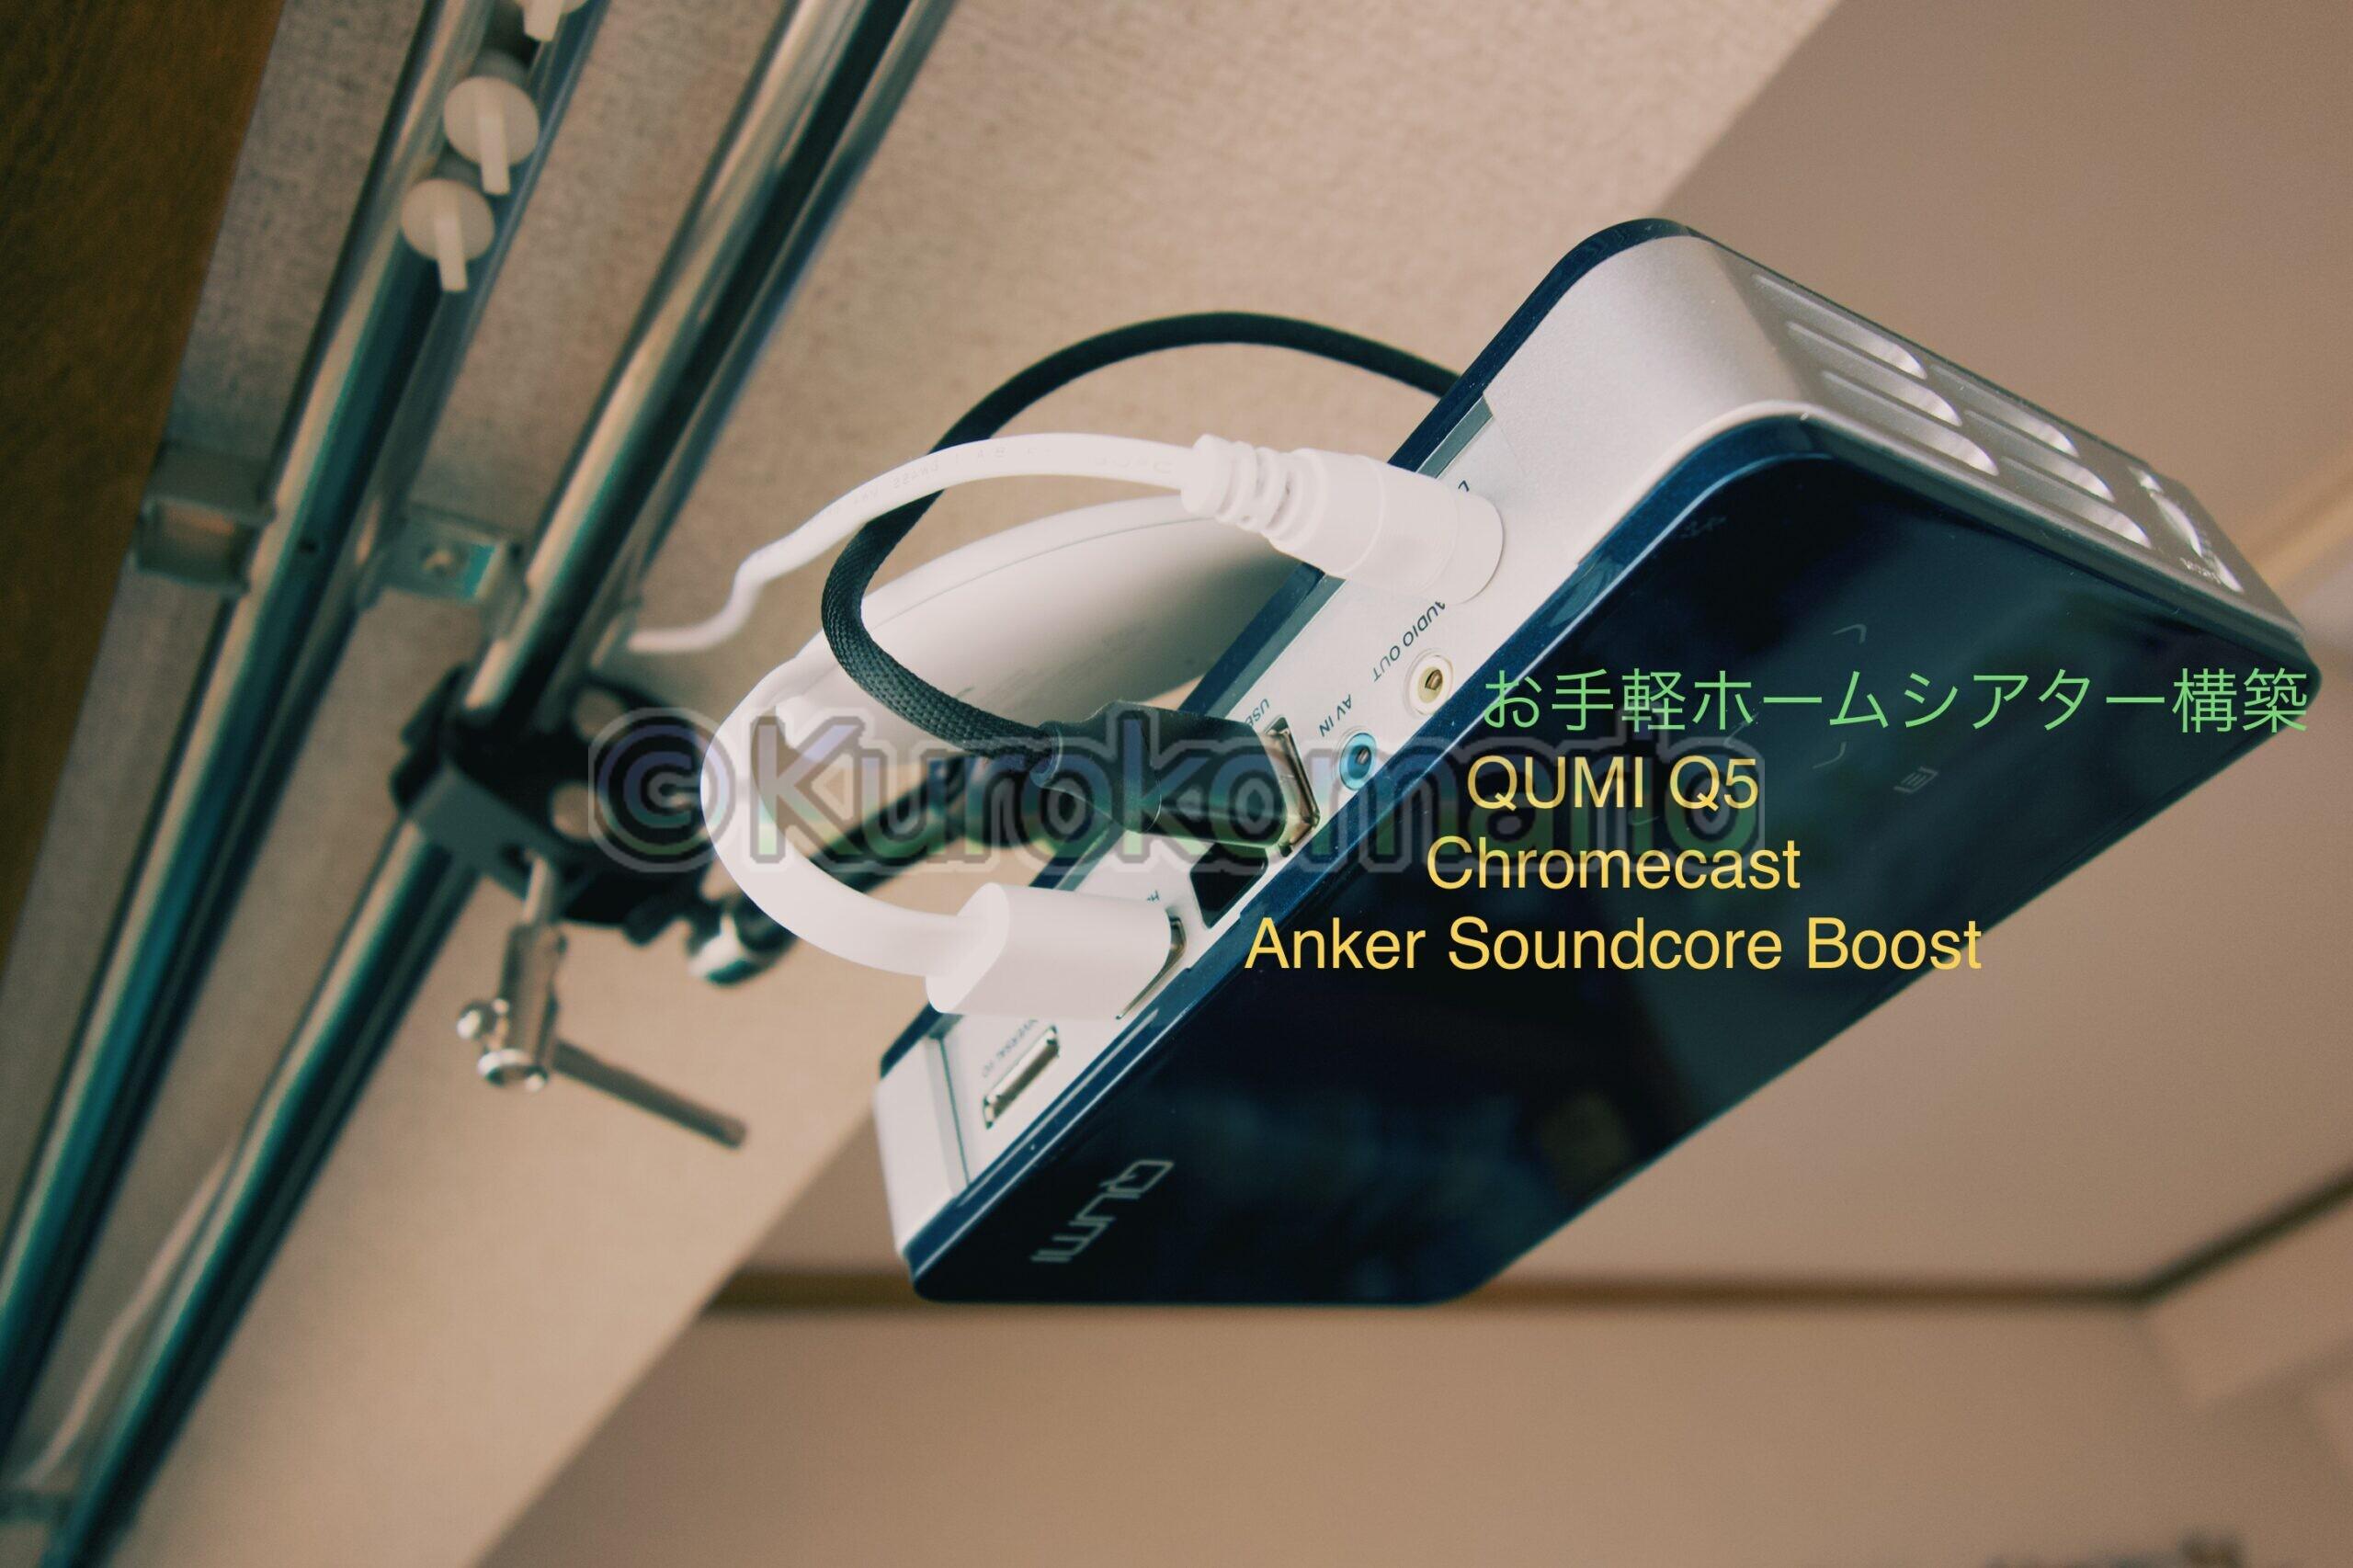 Read more about the article 手軽さ重視なホームシアター構築 | Vivitek QUMI Q5